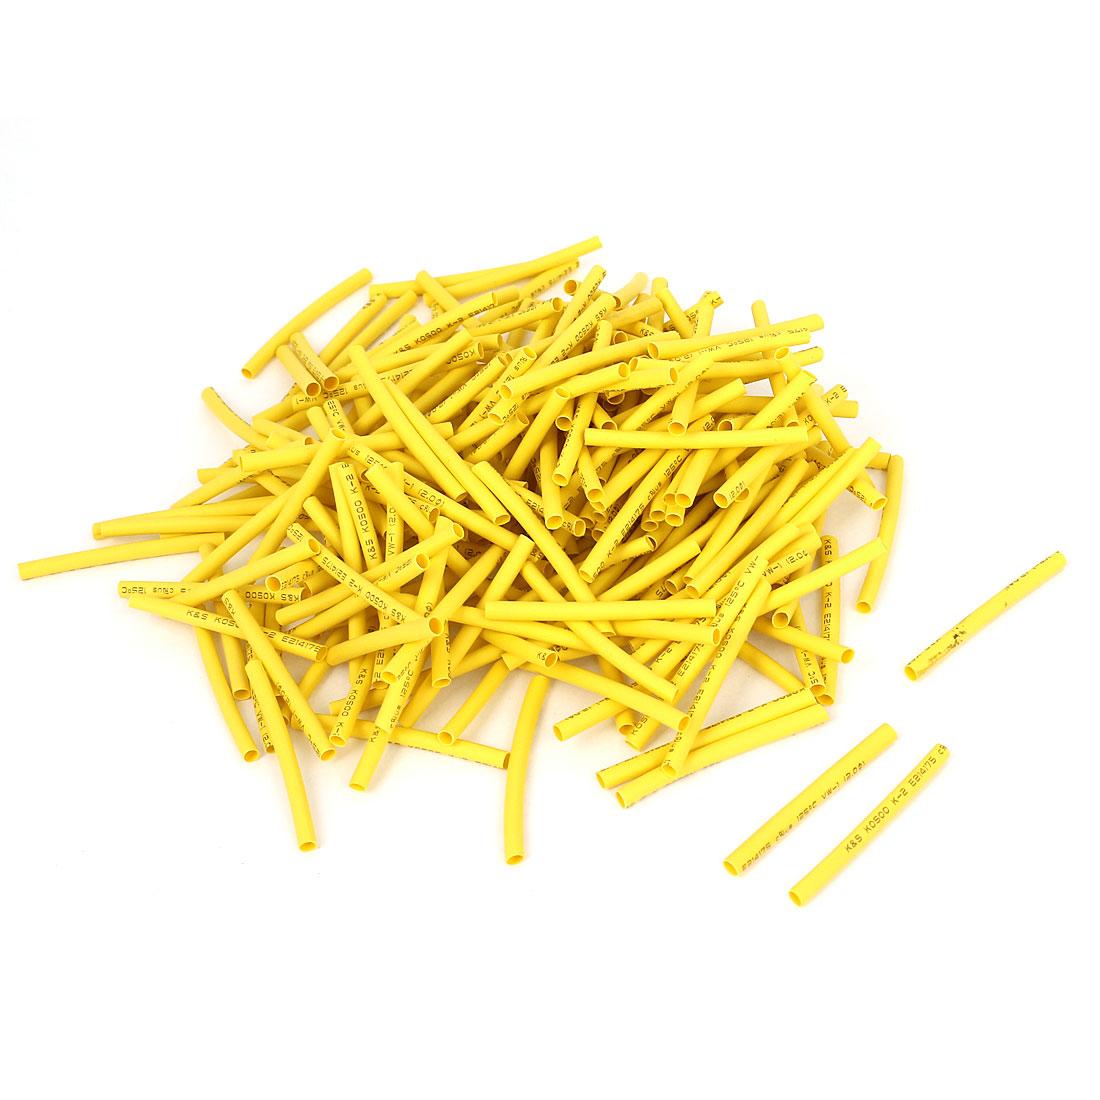 200pcs Yellow 2mm Dia 2:1 Polyolefin Heat Shrink Tubing Shrinkable Tube 40mm